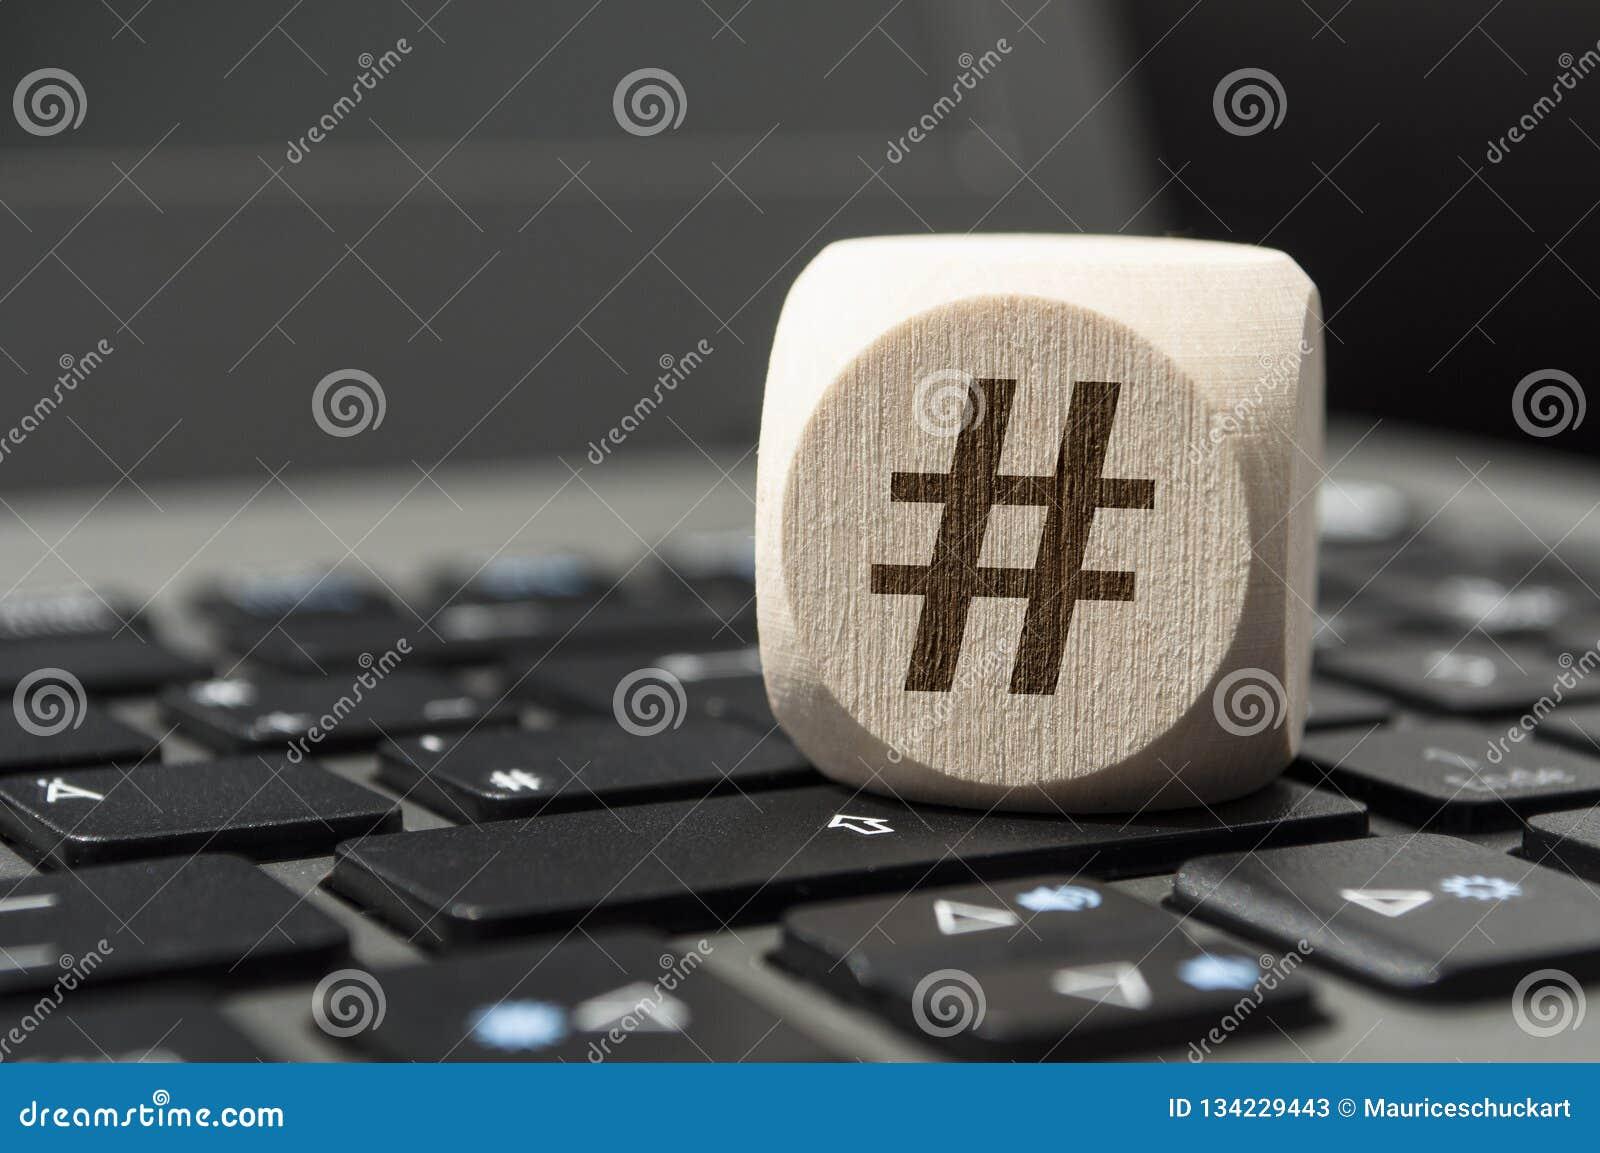 Кость куба с символом Hashtag на клавиатуре